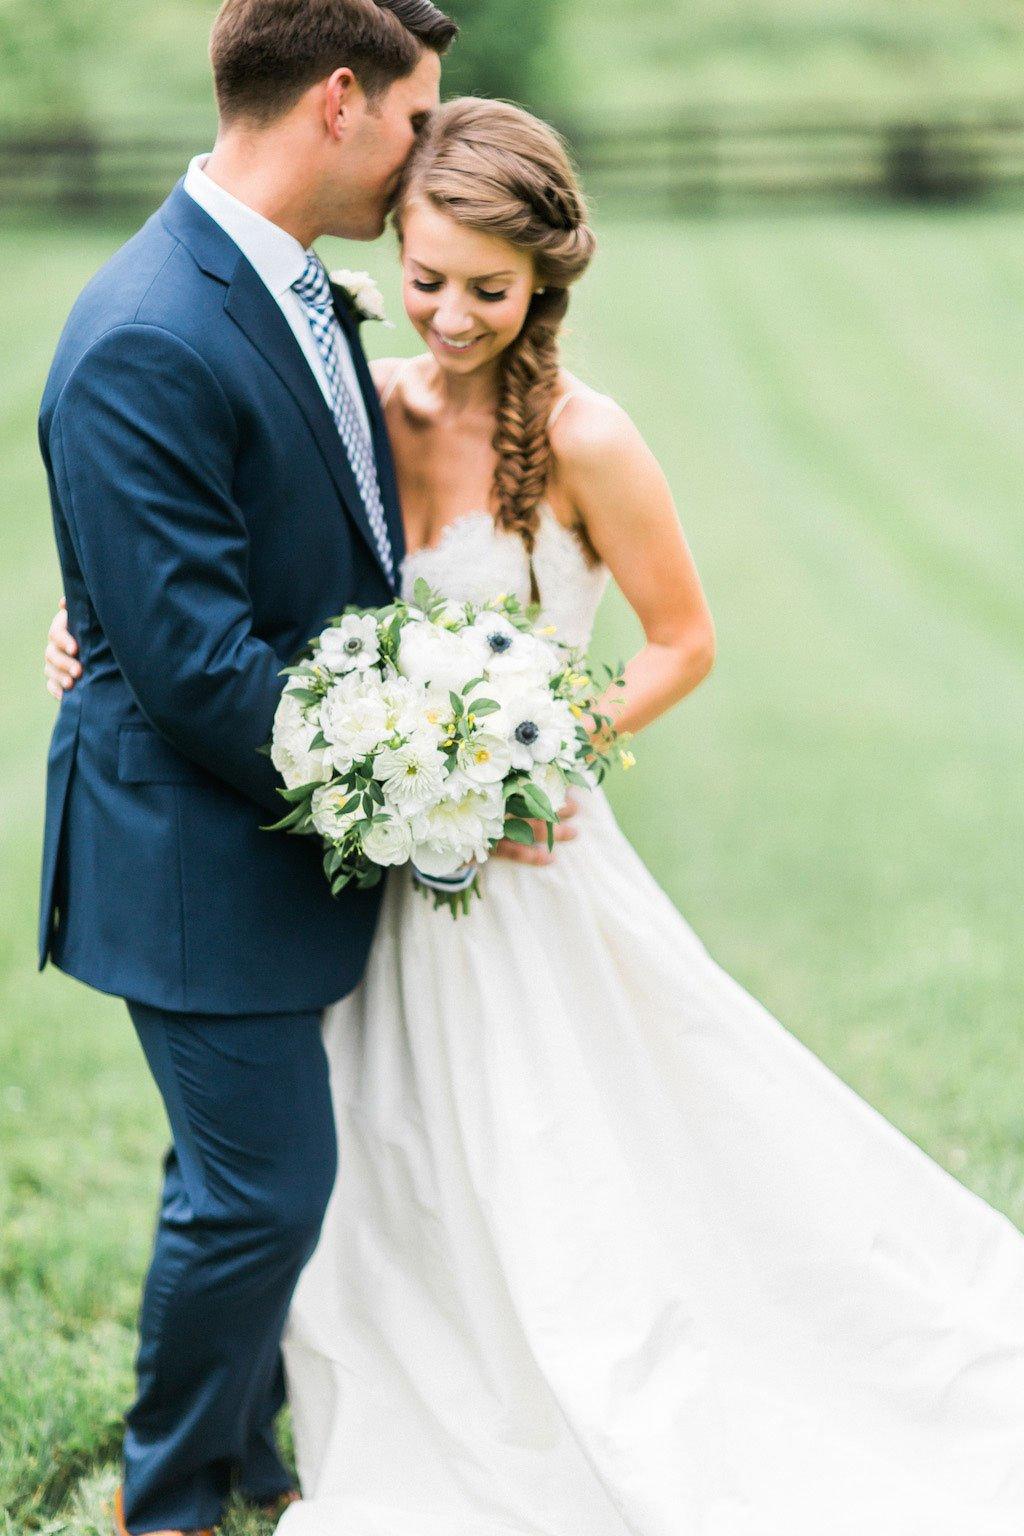 8-4-16-white-rustic-modern-farm-wedding-virginia-12NEW